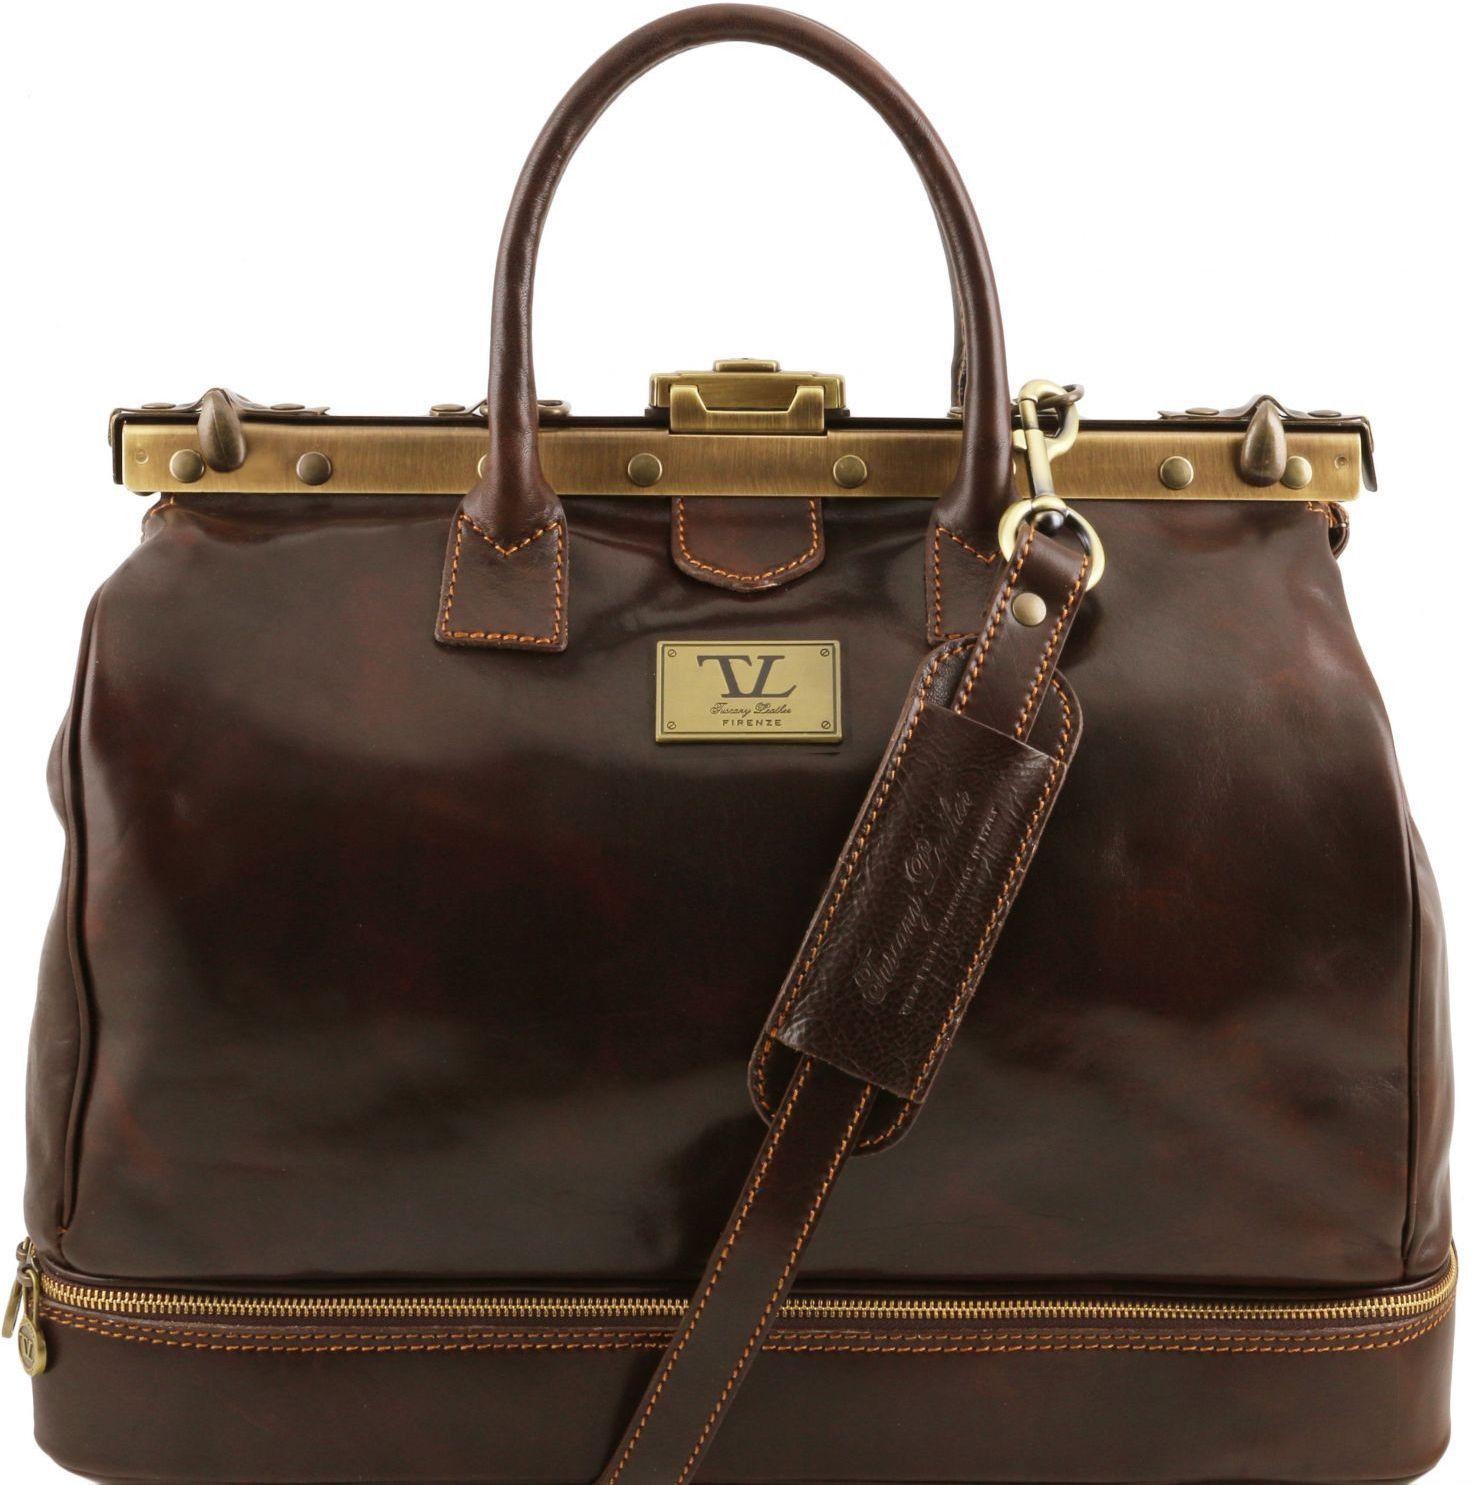 11bc07d93b Ιατρική Τσάντα   Βαλίτσα Δερμάτινη Barcelona Καφέ σκούρο Tuscany Leather